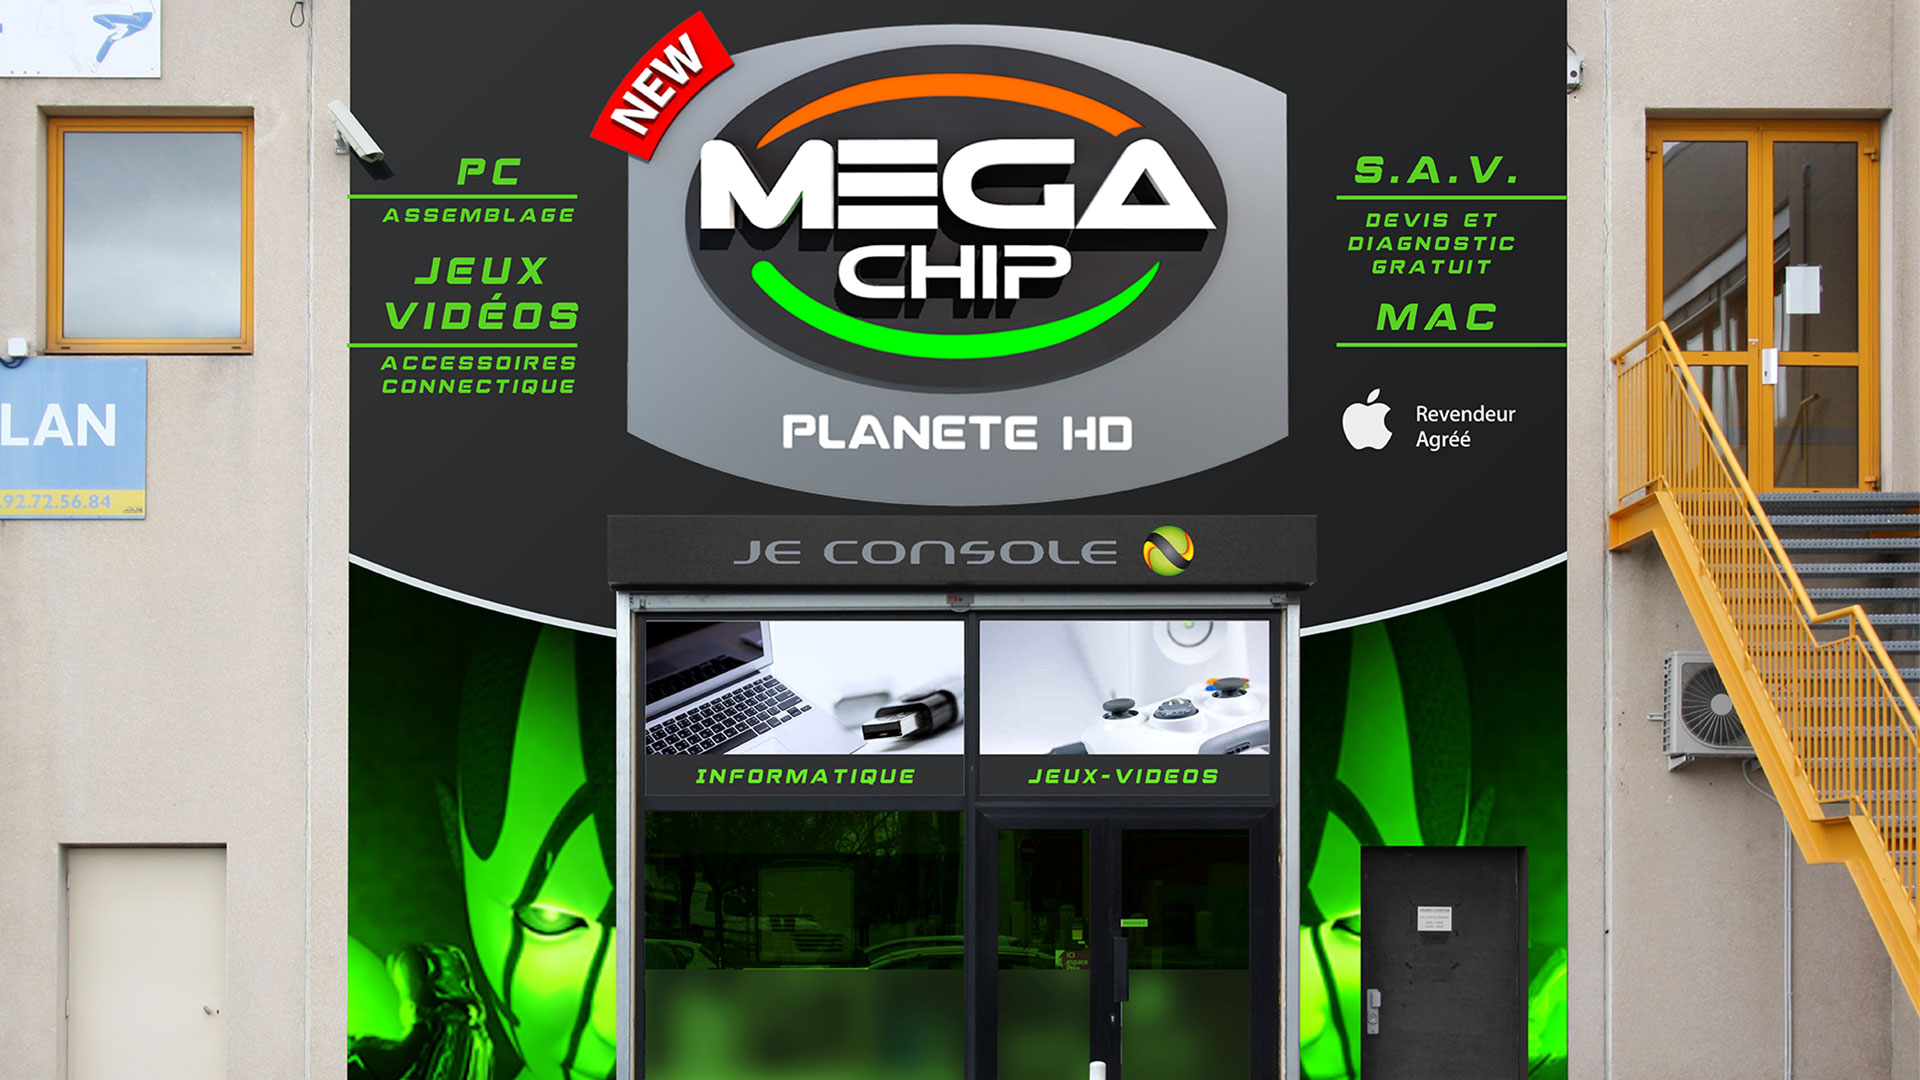 Enseigne Mega Chip